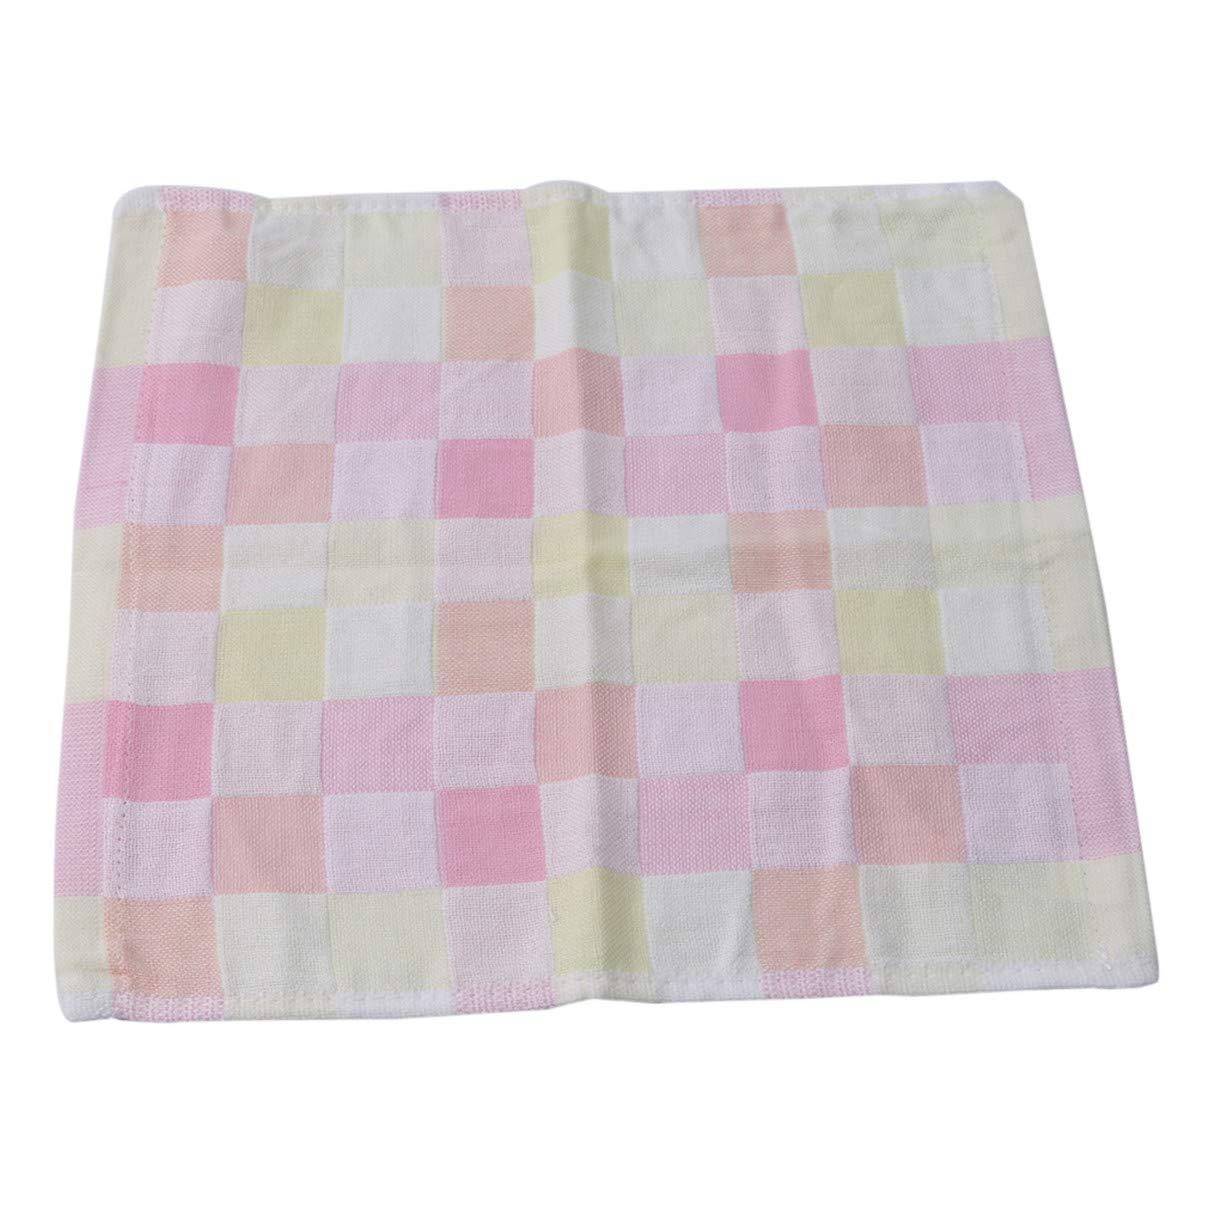 Essencedelight Cotton Towel Gauze Square Soft Washcloths Bath Adult Wash Face Towel Multi-Purpose Household Wash Wipe Towel